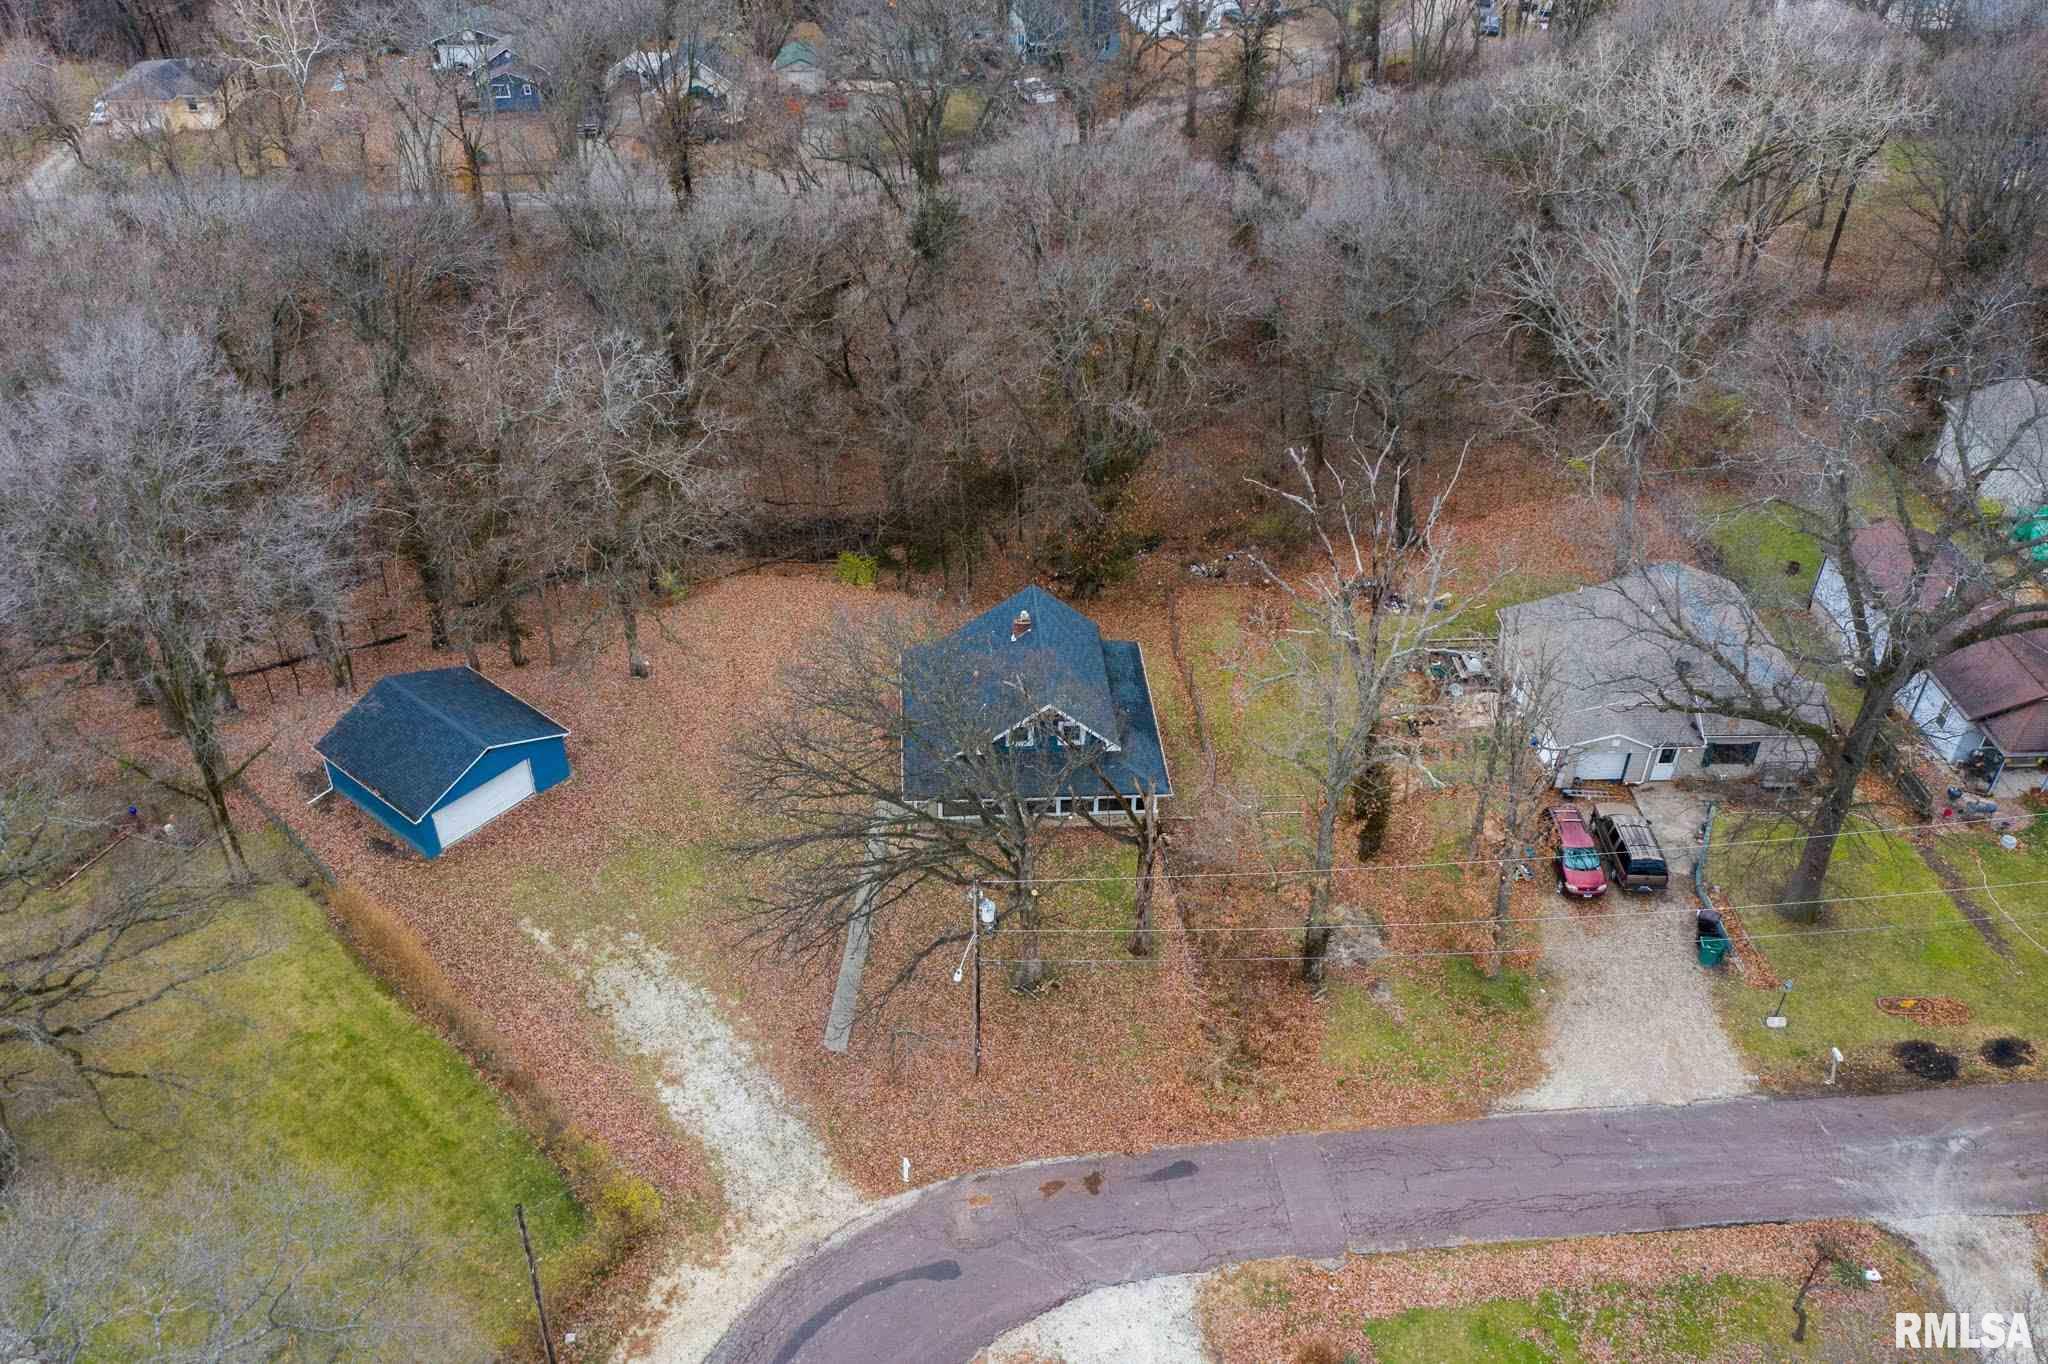 252 SYLVAN Property Photo - Creve Coeur, IL real estate listing